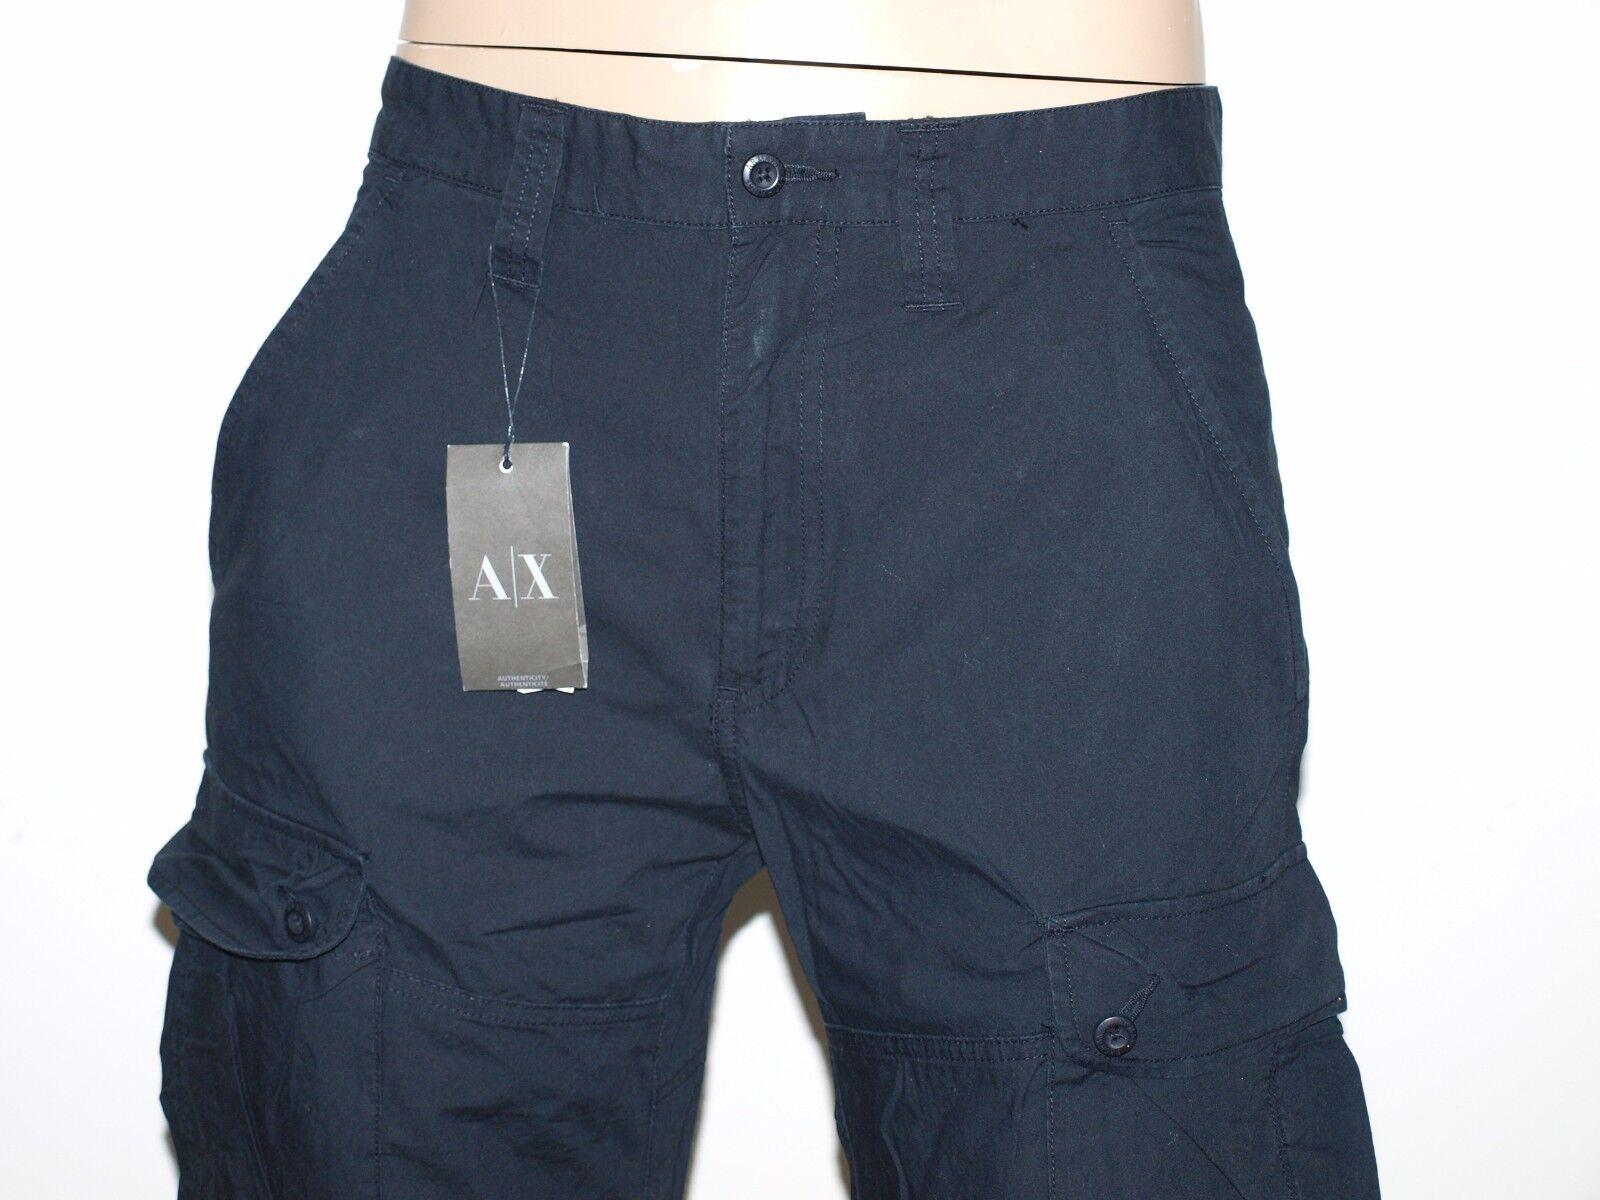 ARMANI EXCHANGE Authentic Utility Cotton Relaxed Cargo Pants NWT OT6P100VA